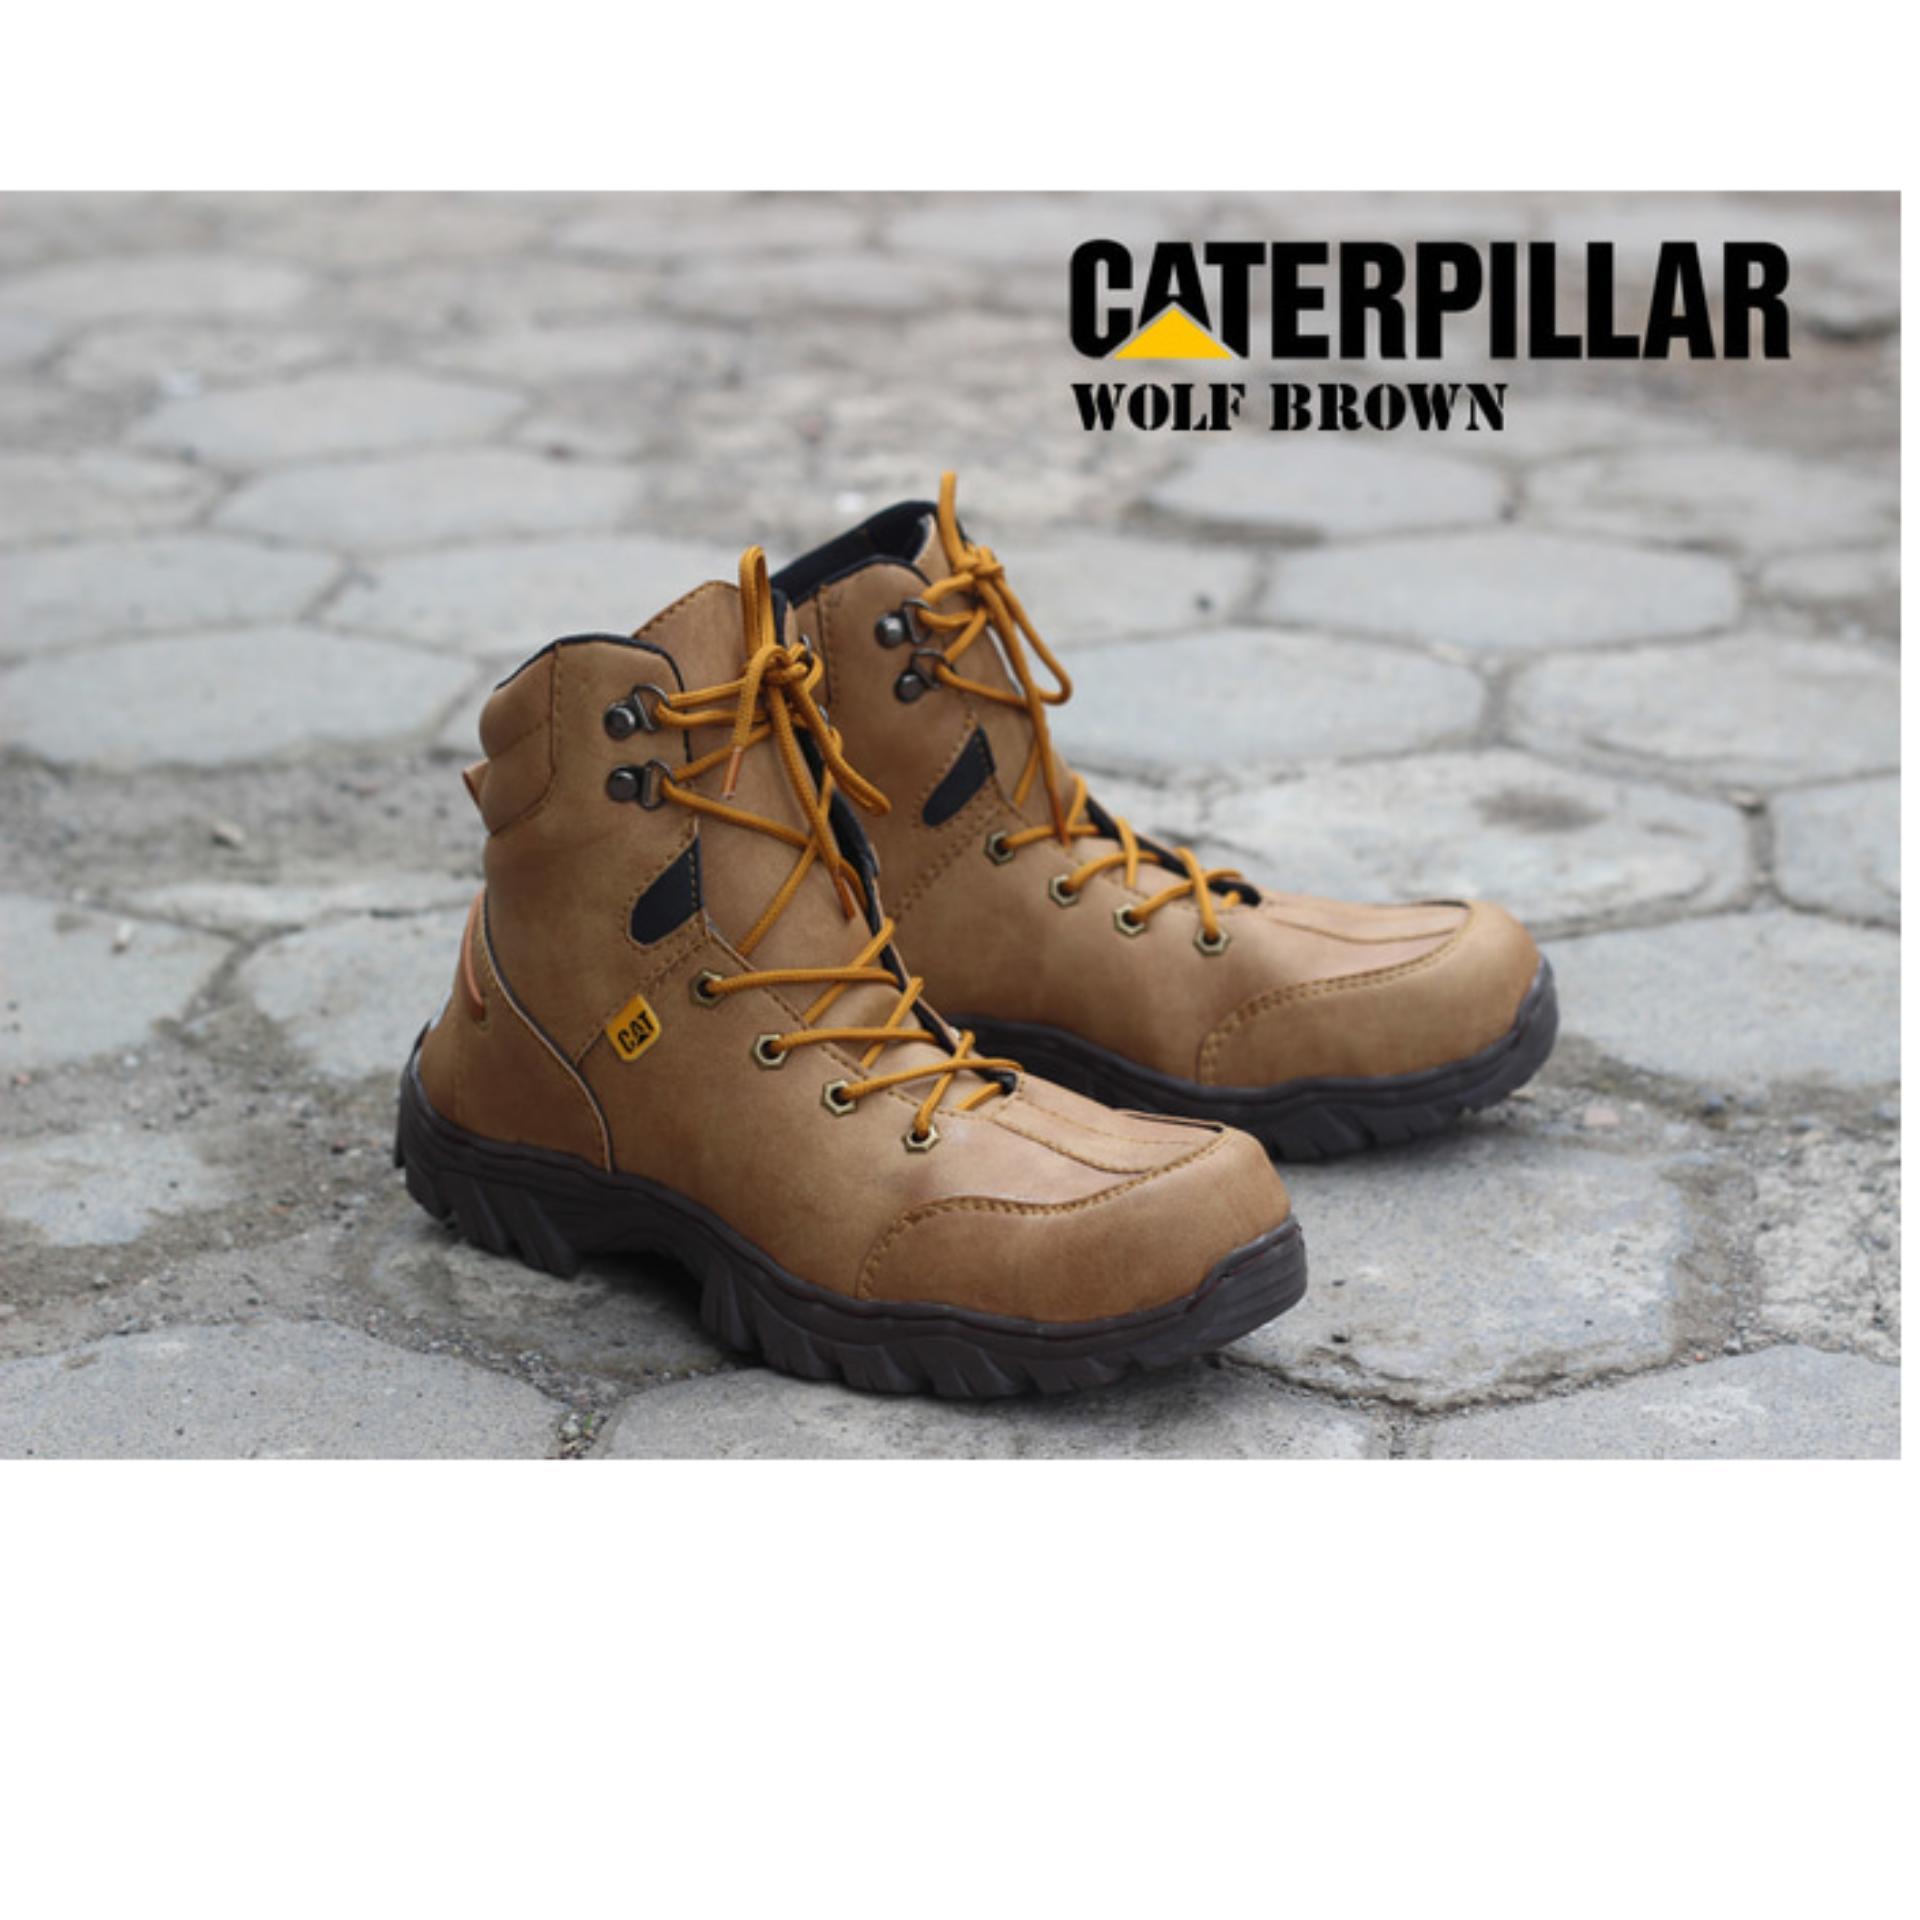 Sepatu Caterpillar Boots Wolf Brown